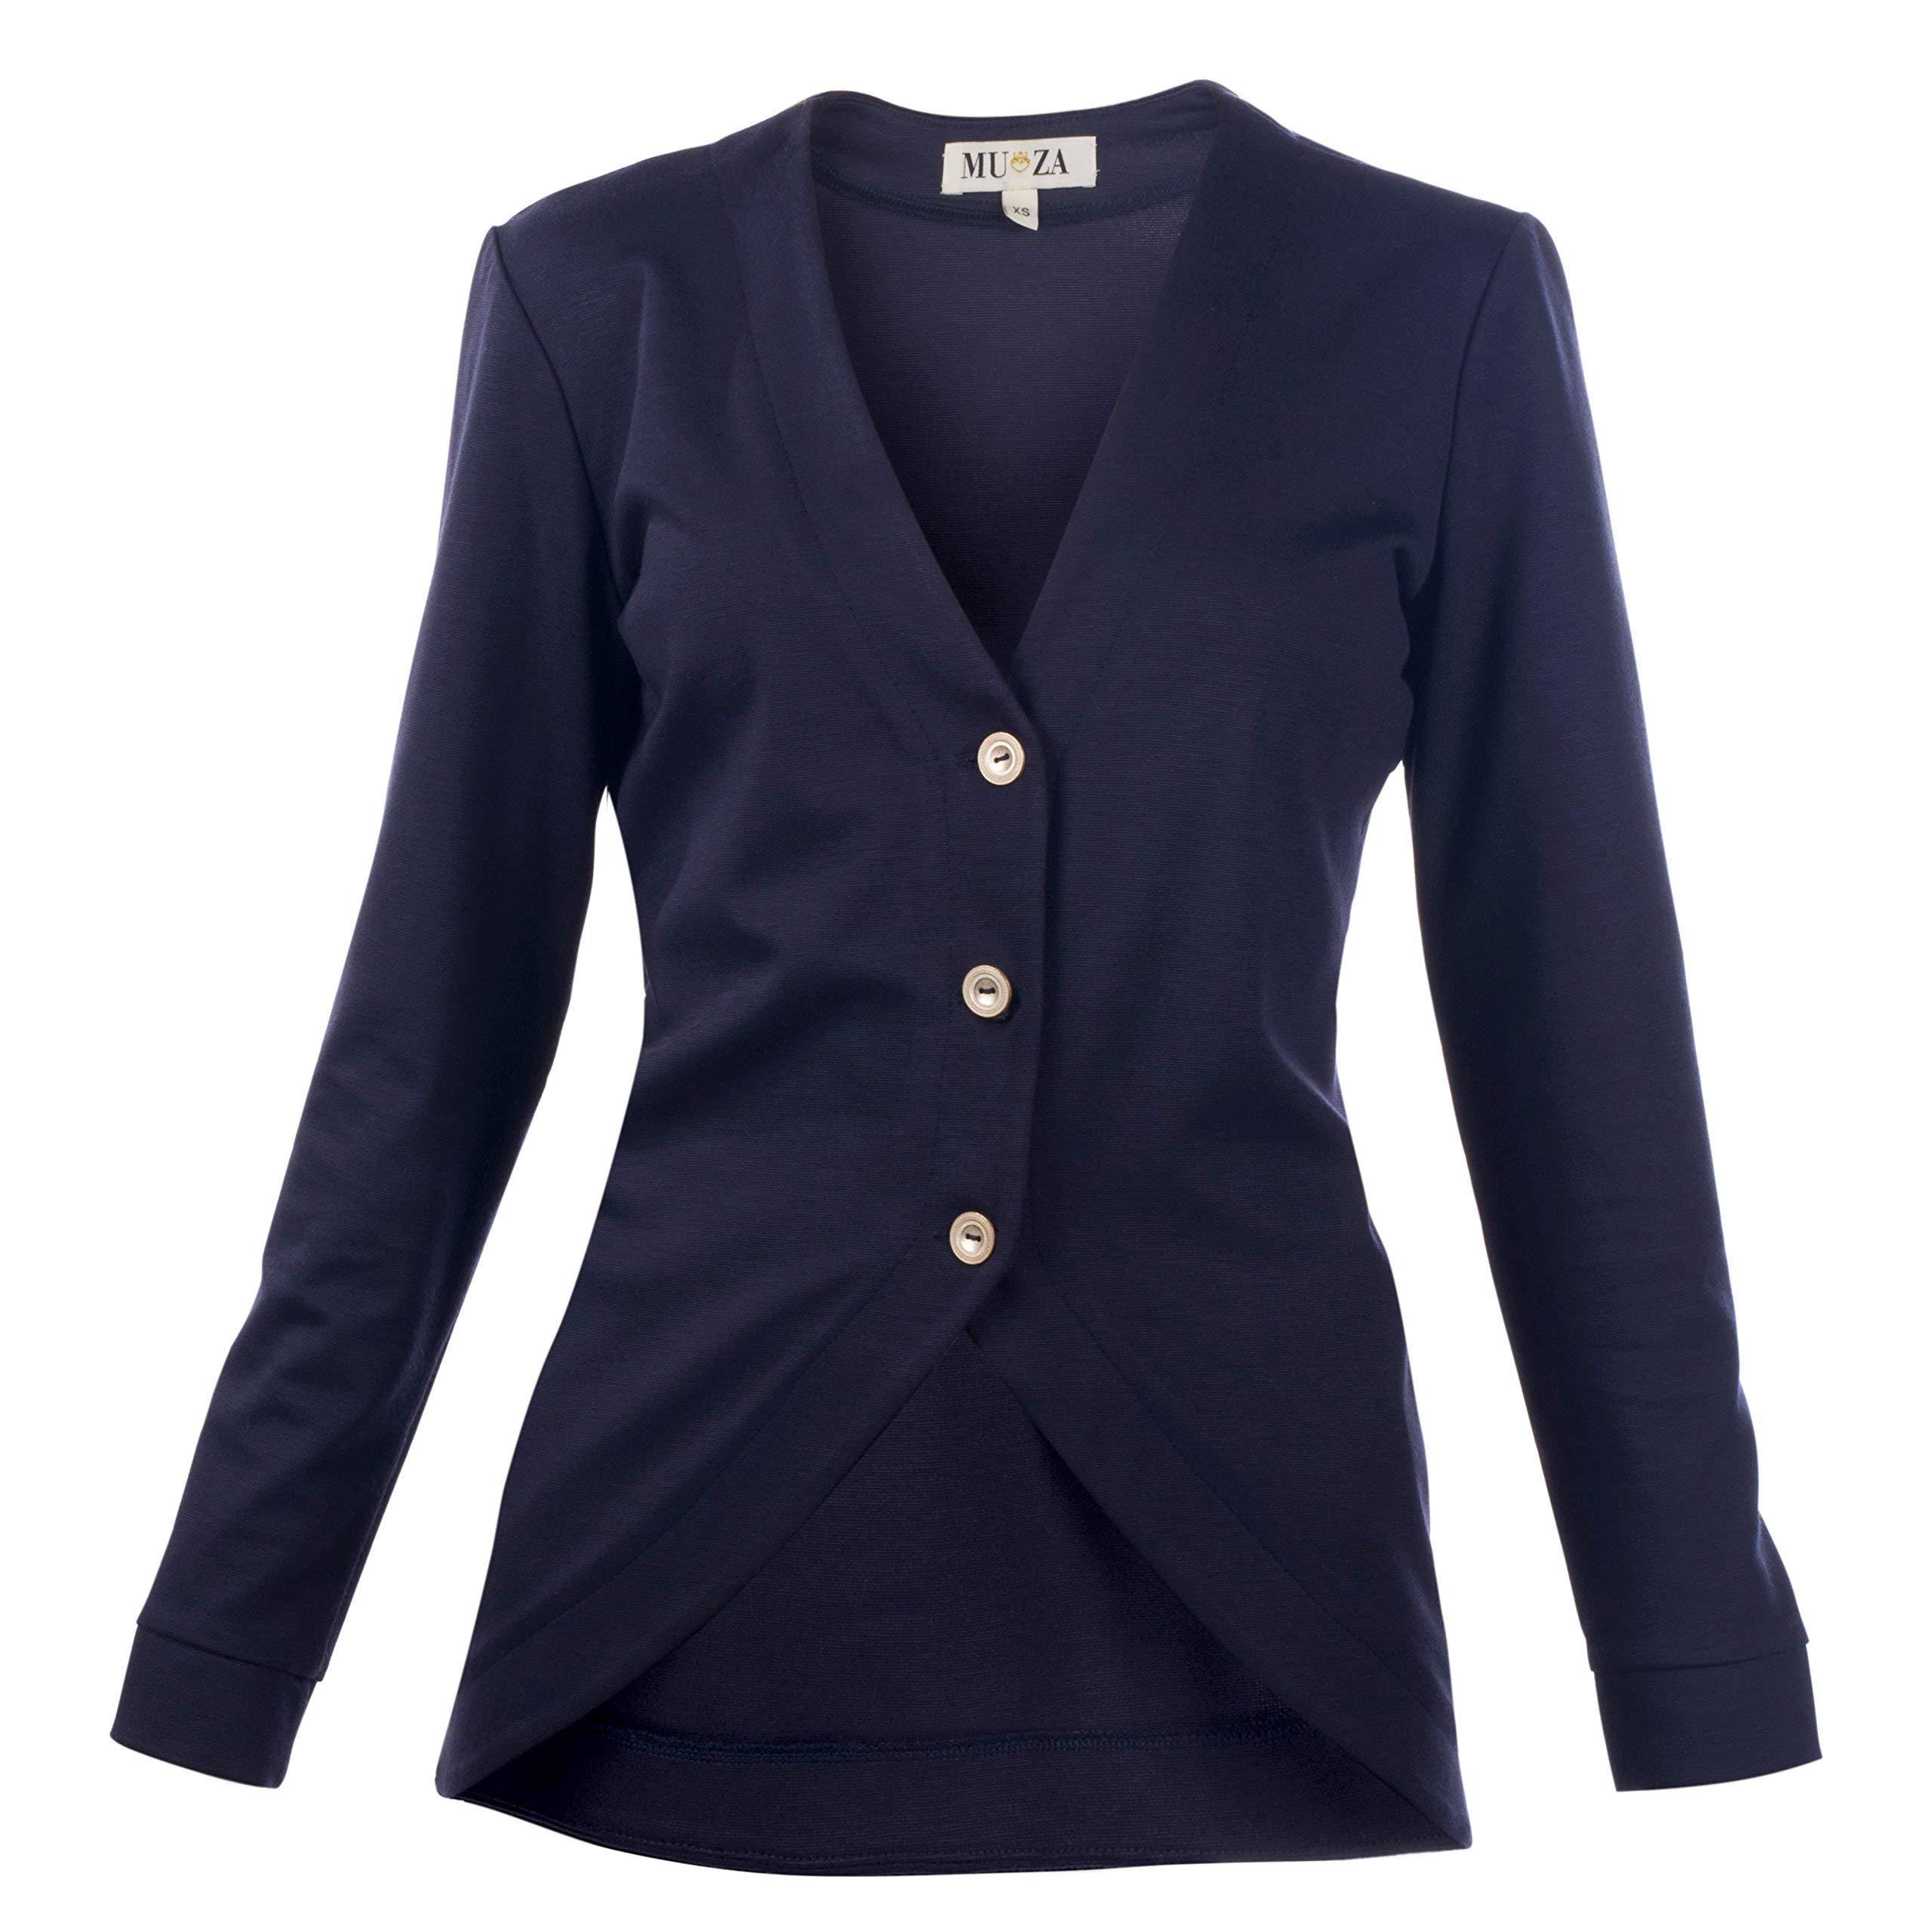 Navy Button Up Cardigan Casual Blazer Women's Jersey Jacket